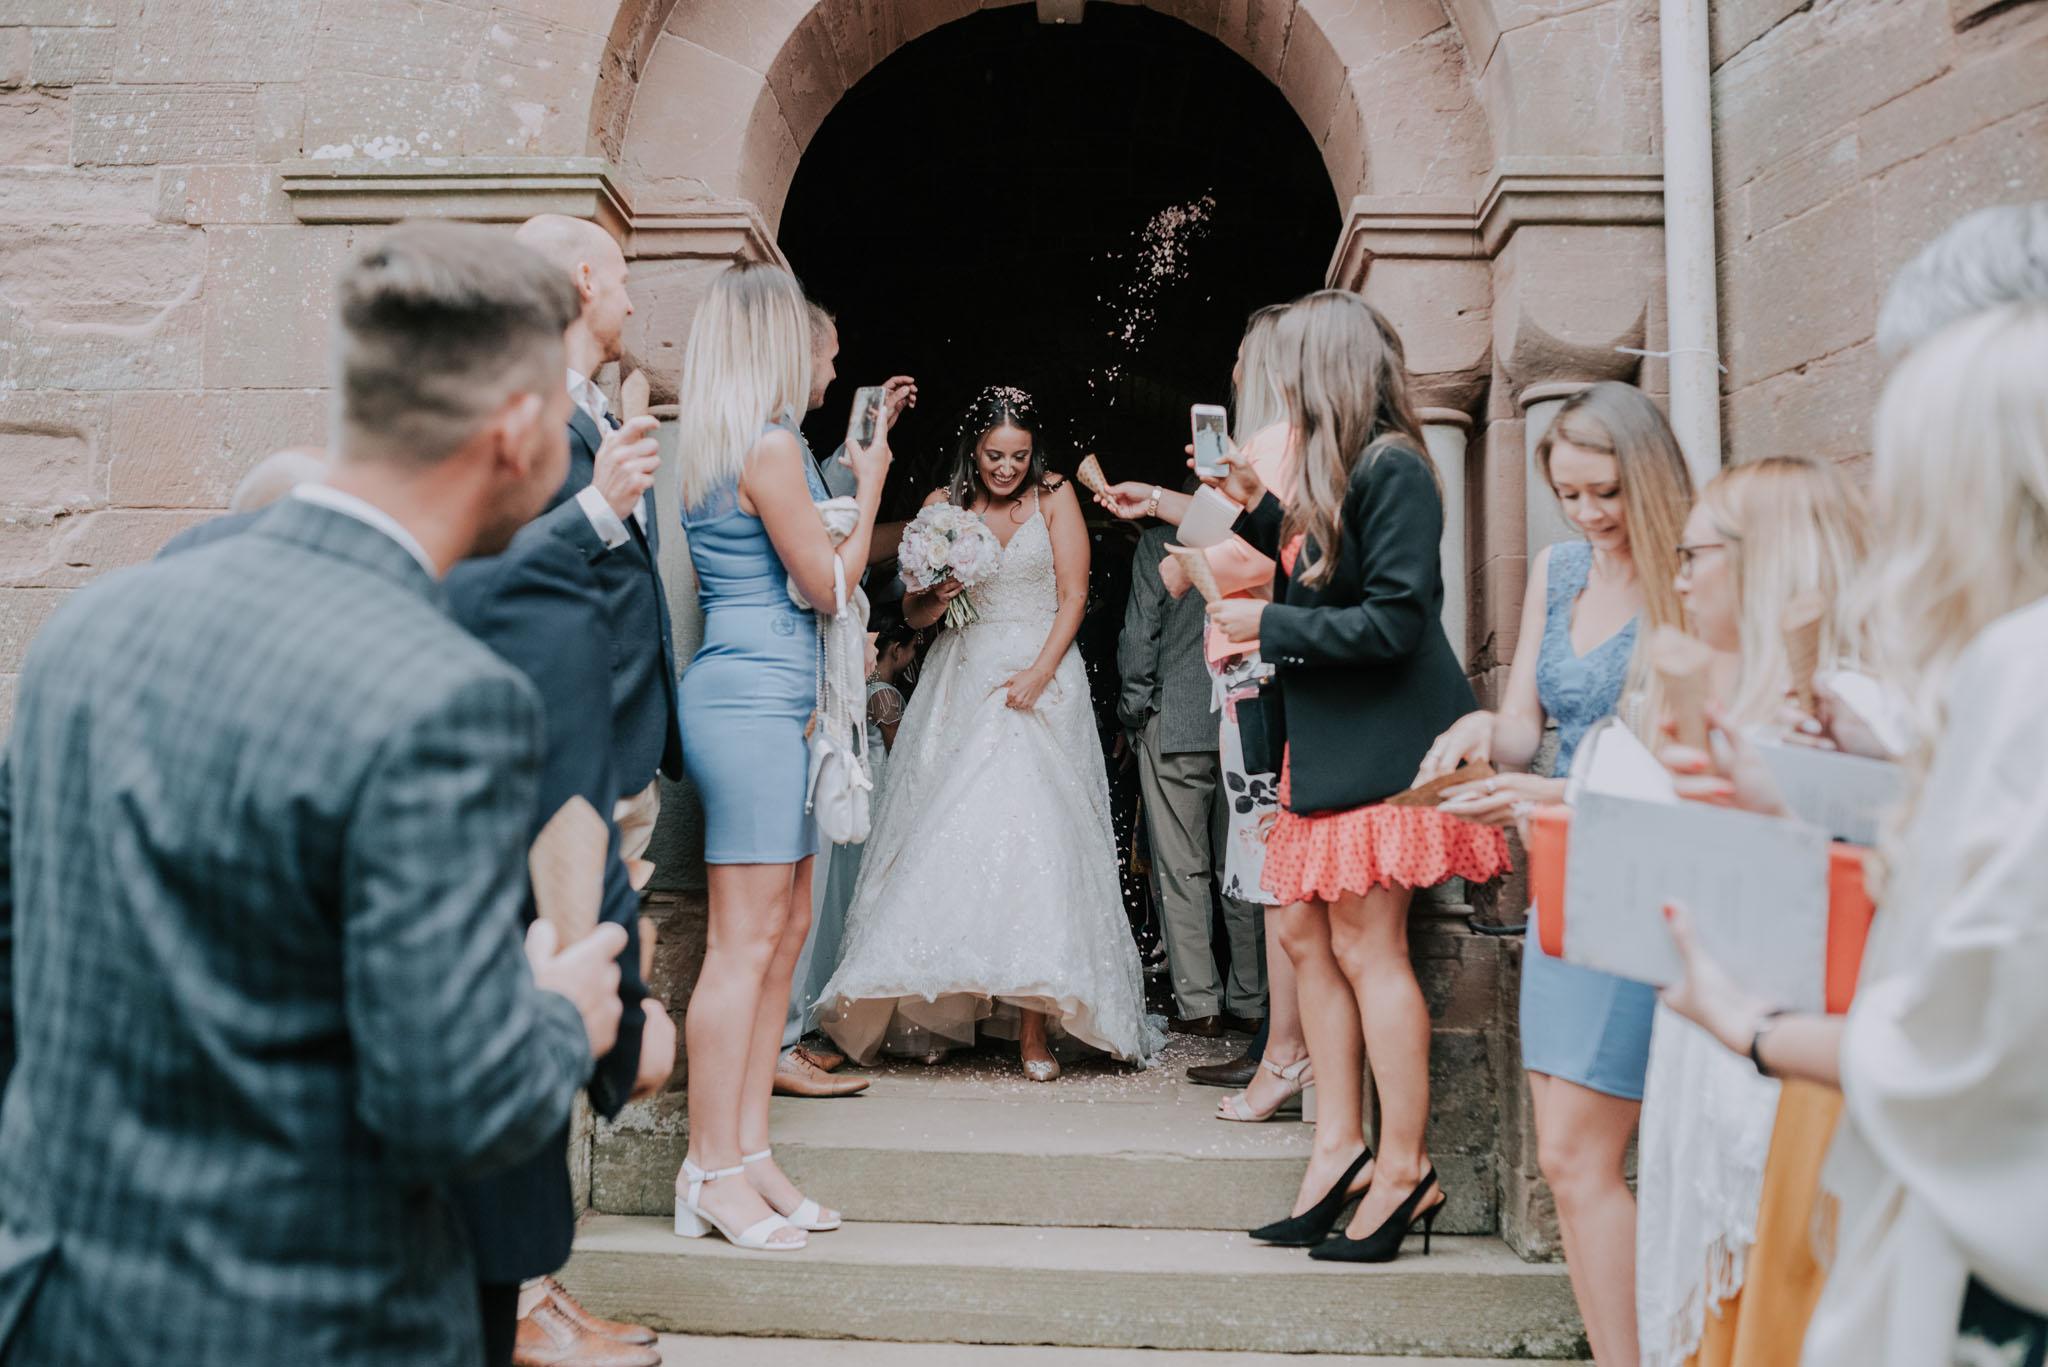 wedding-photographer-glewstone-court-hereford-scott-stockwell-photography264.jpg